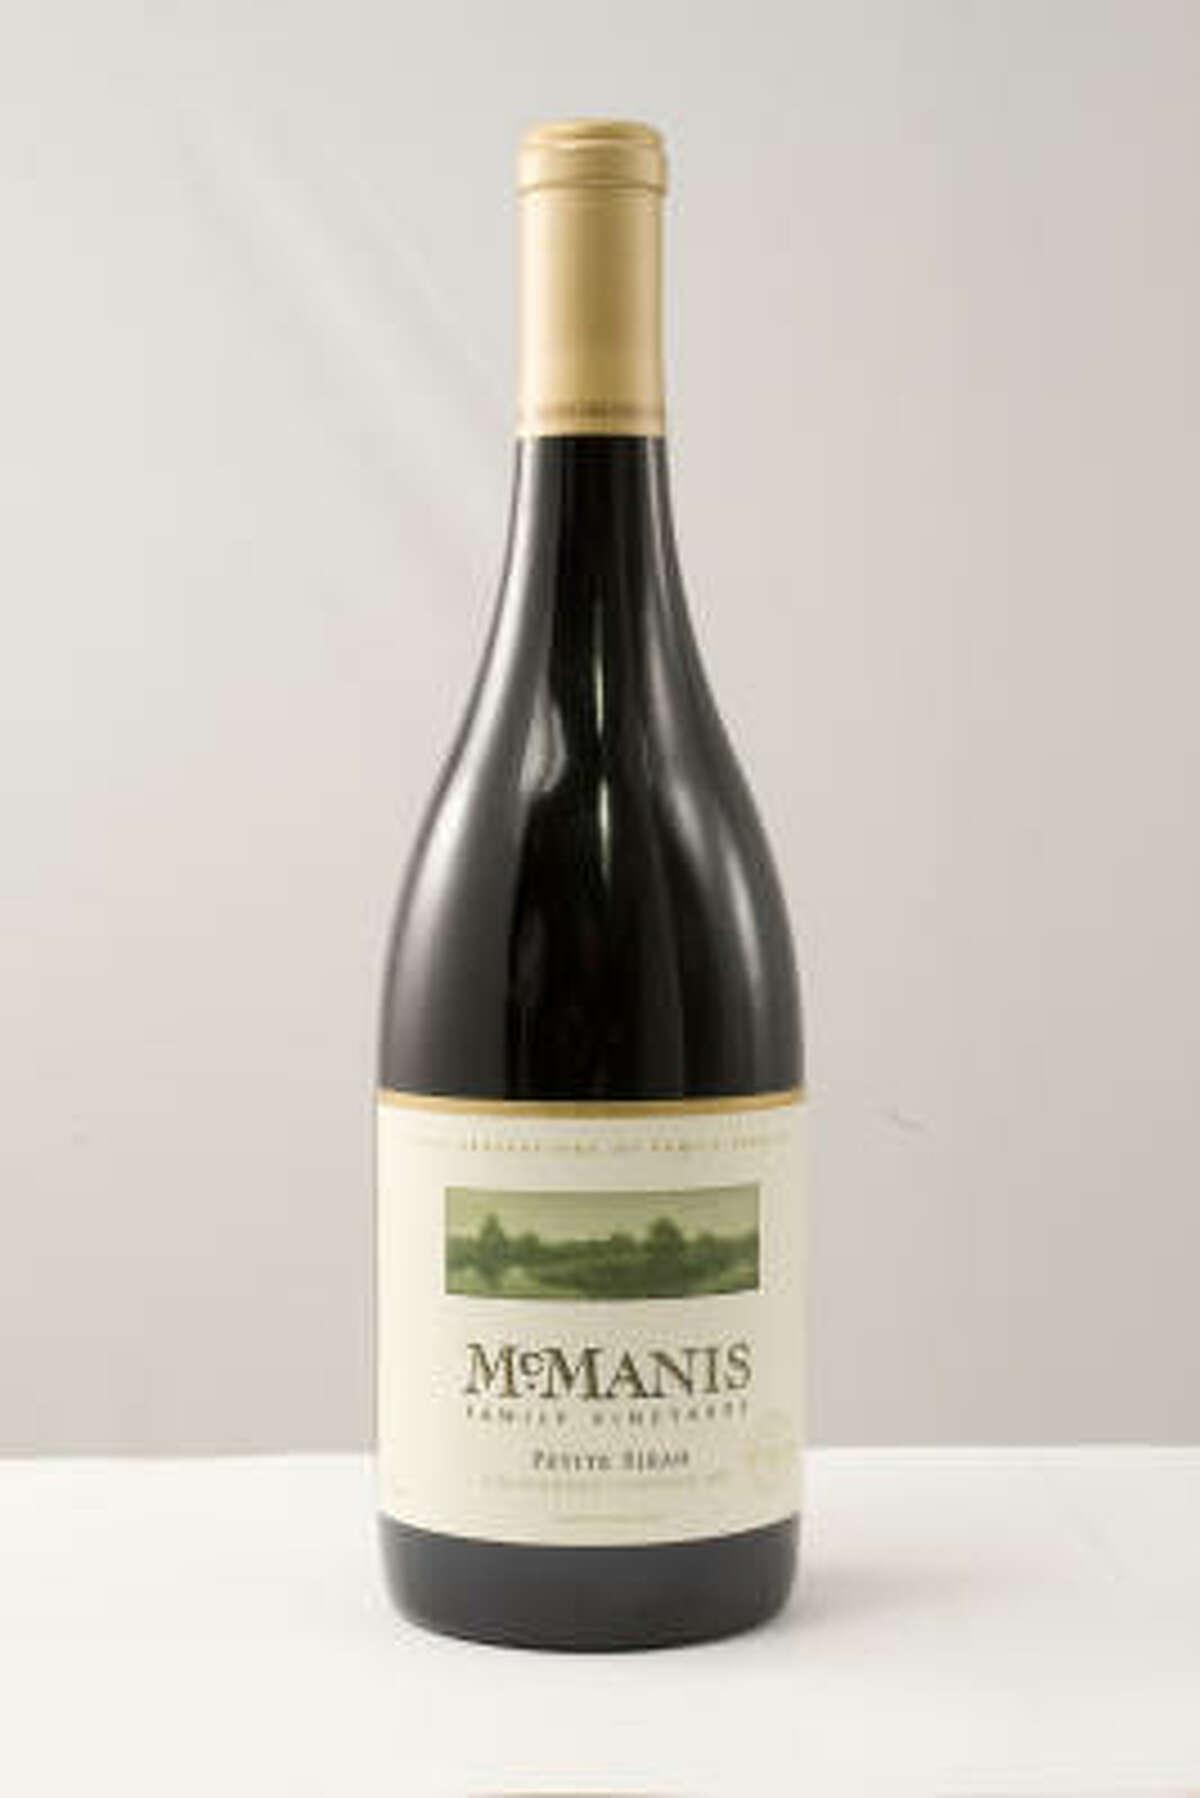 Reserve Grand Champion Best of Show: 2007 McManis Family Vineyards Petite Sirah, California.